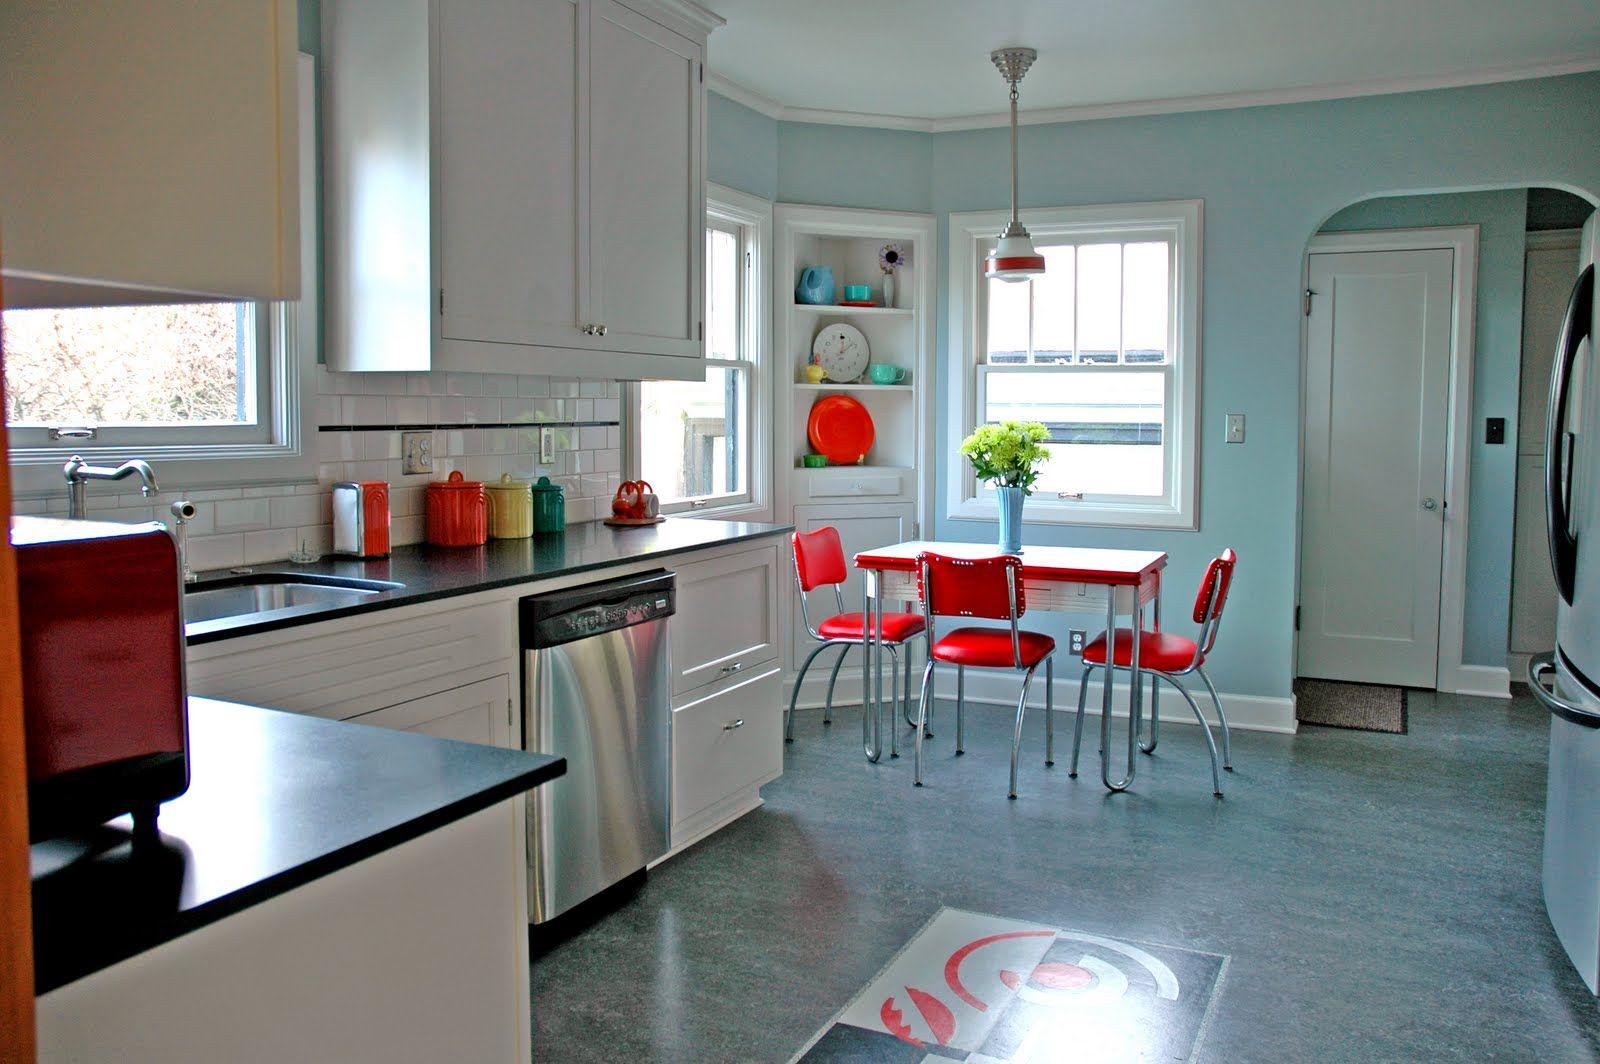 1929 English Tudor Kitchen Remodel Featuring Custom Art Deco Inspired Inlay  Linoleum Floor